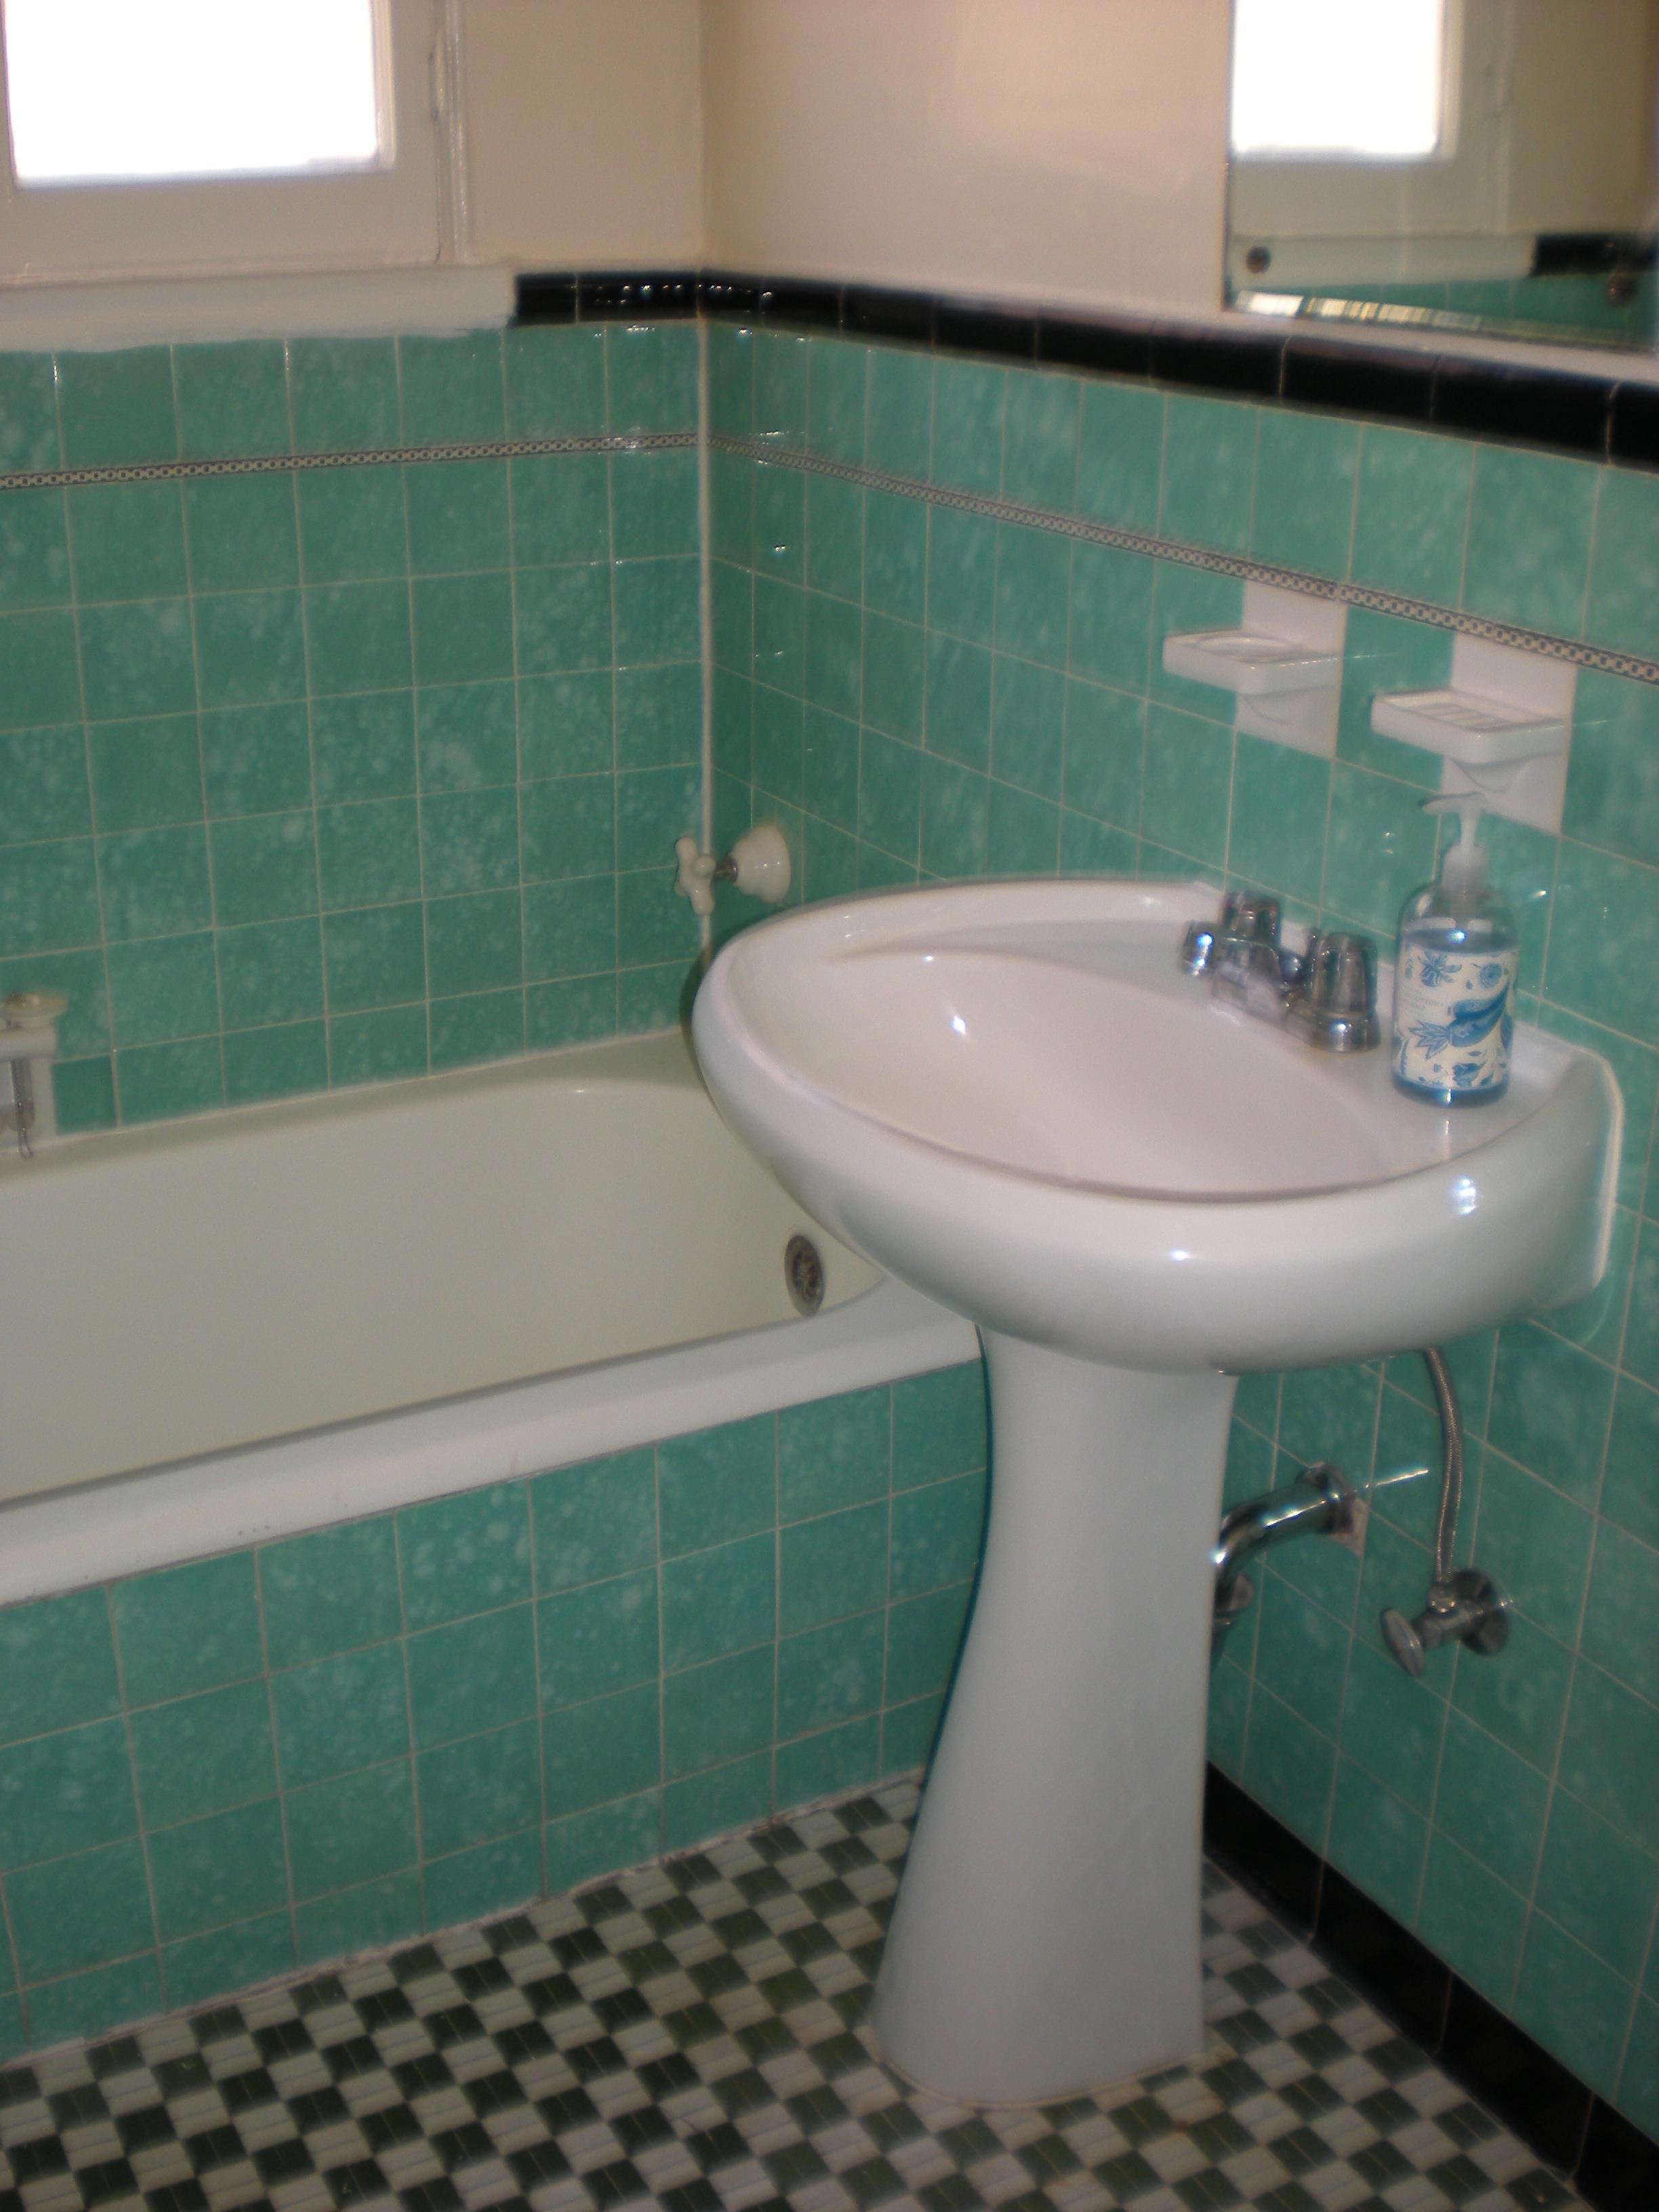 Available apartments 187 stanley avenue apartment art deco bathroom